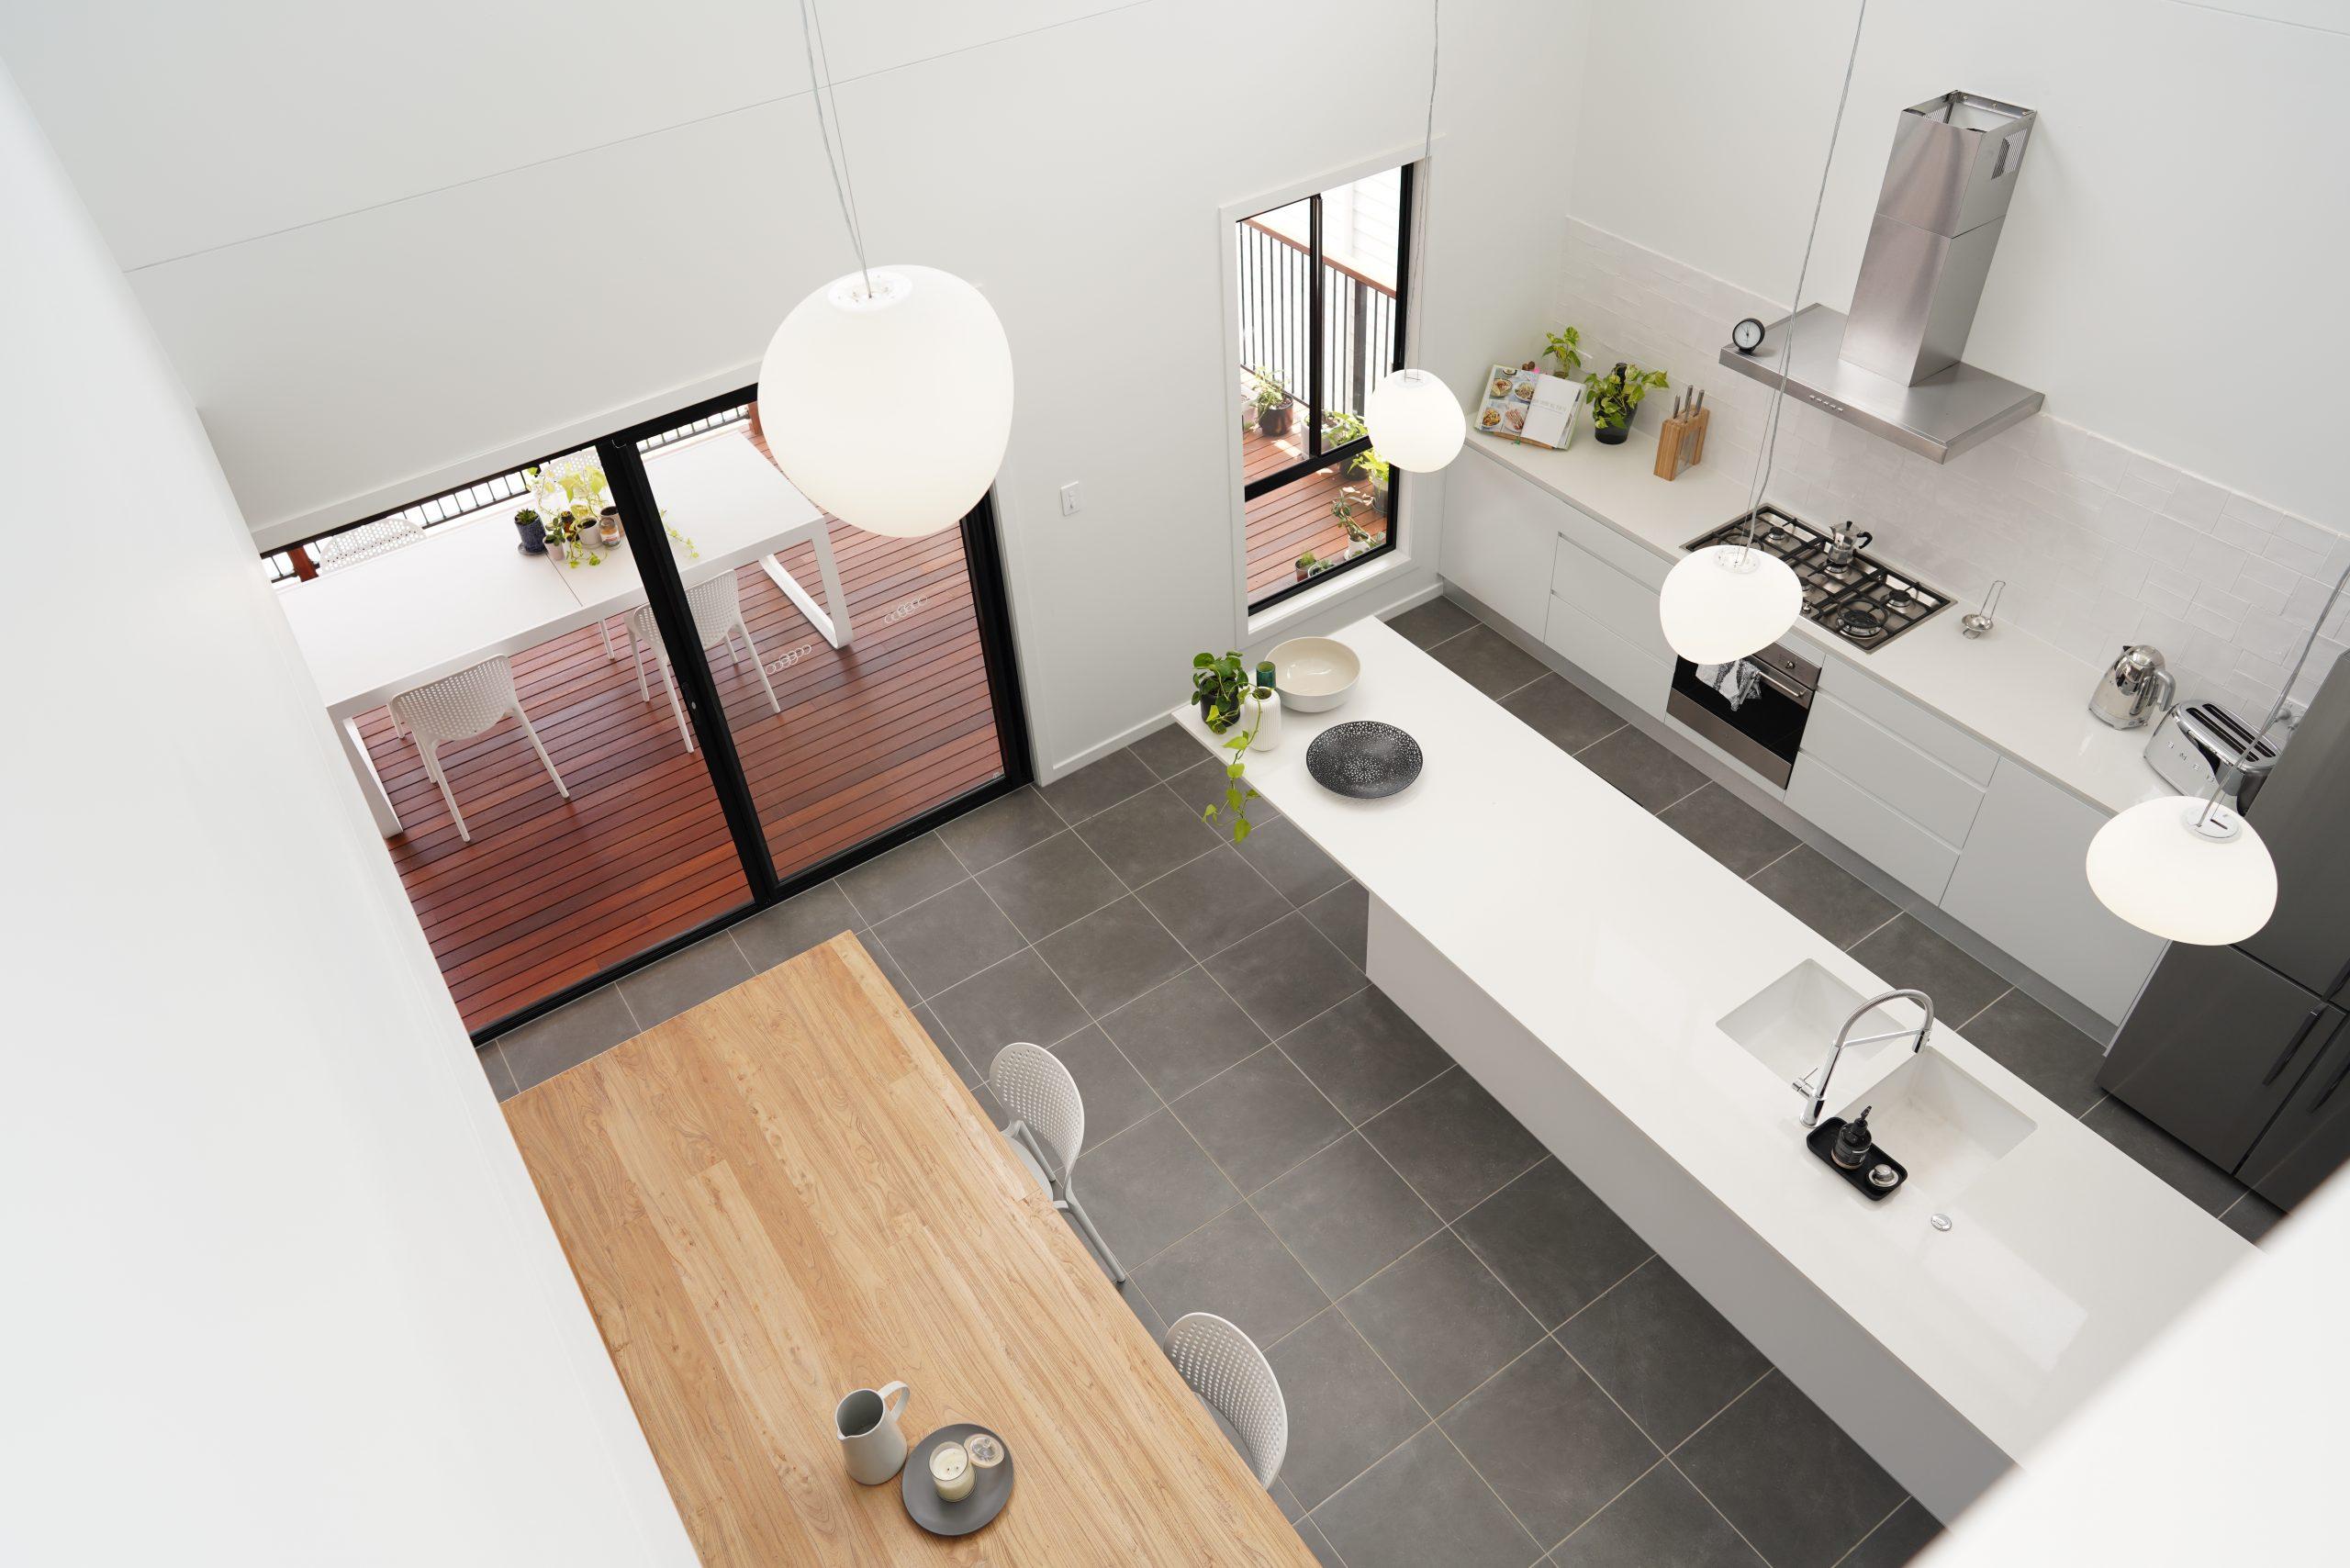 Interior shot of Preferred Homes' open-plan design